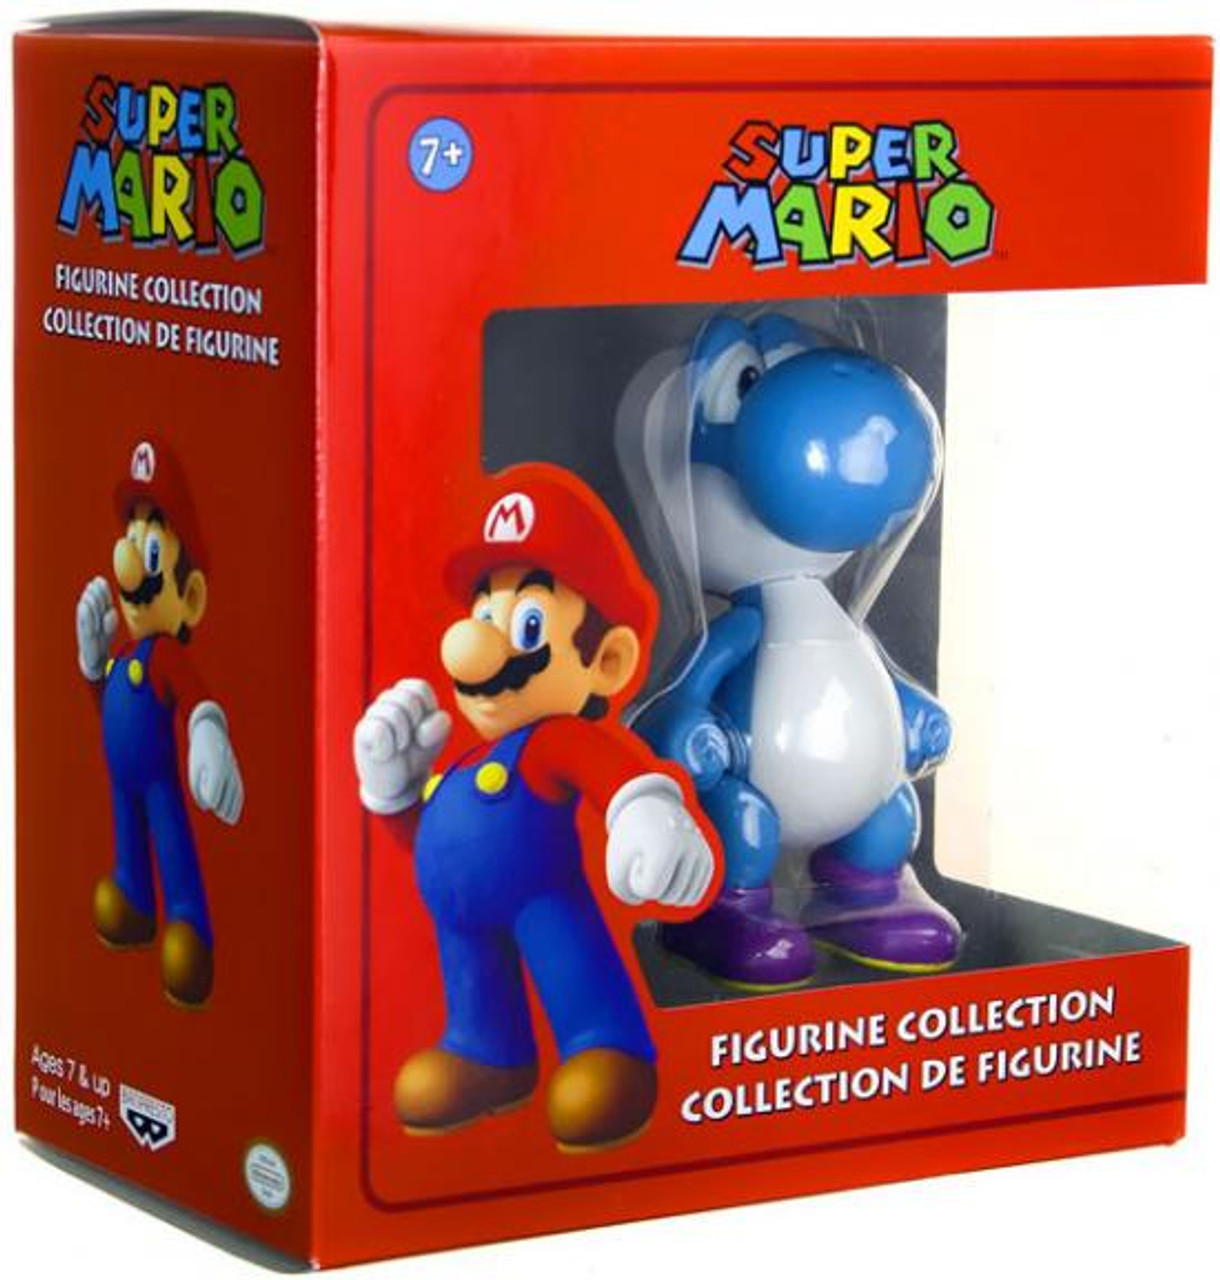 Super Mario Figurine Collection Yoshi 5-Inch Figure [Blue]